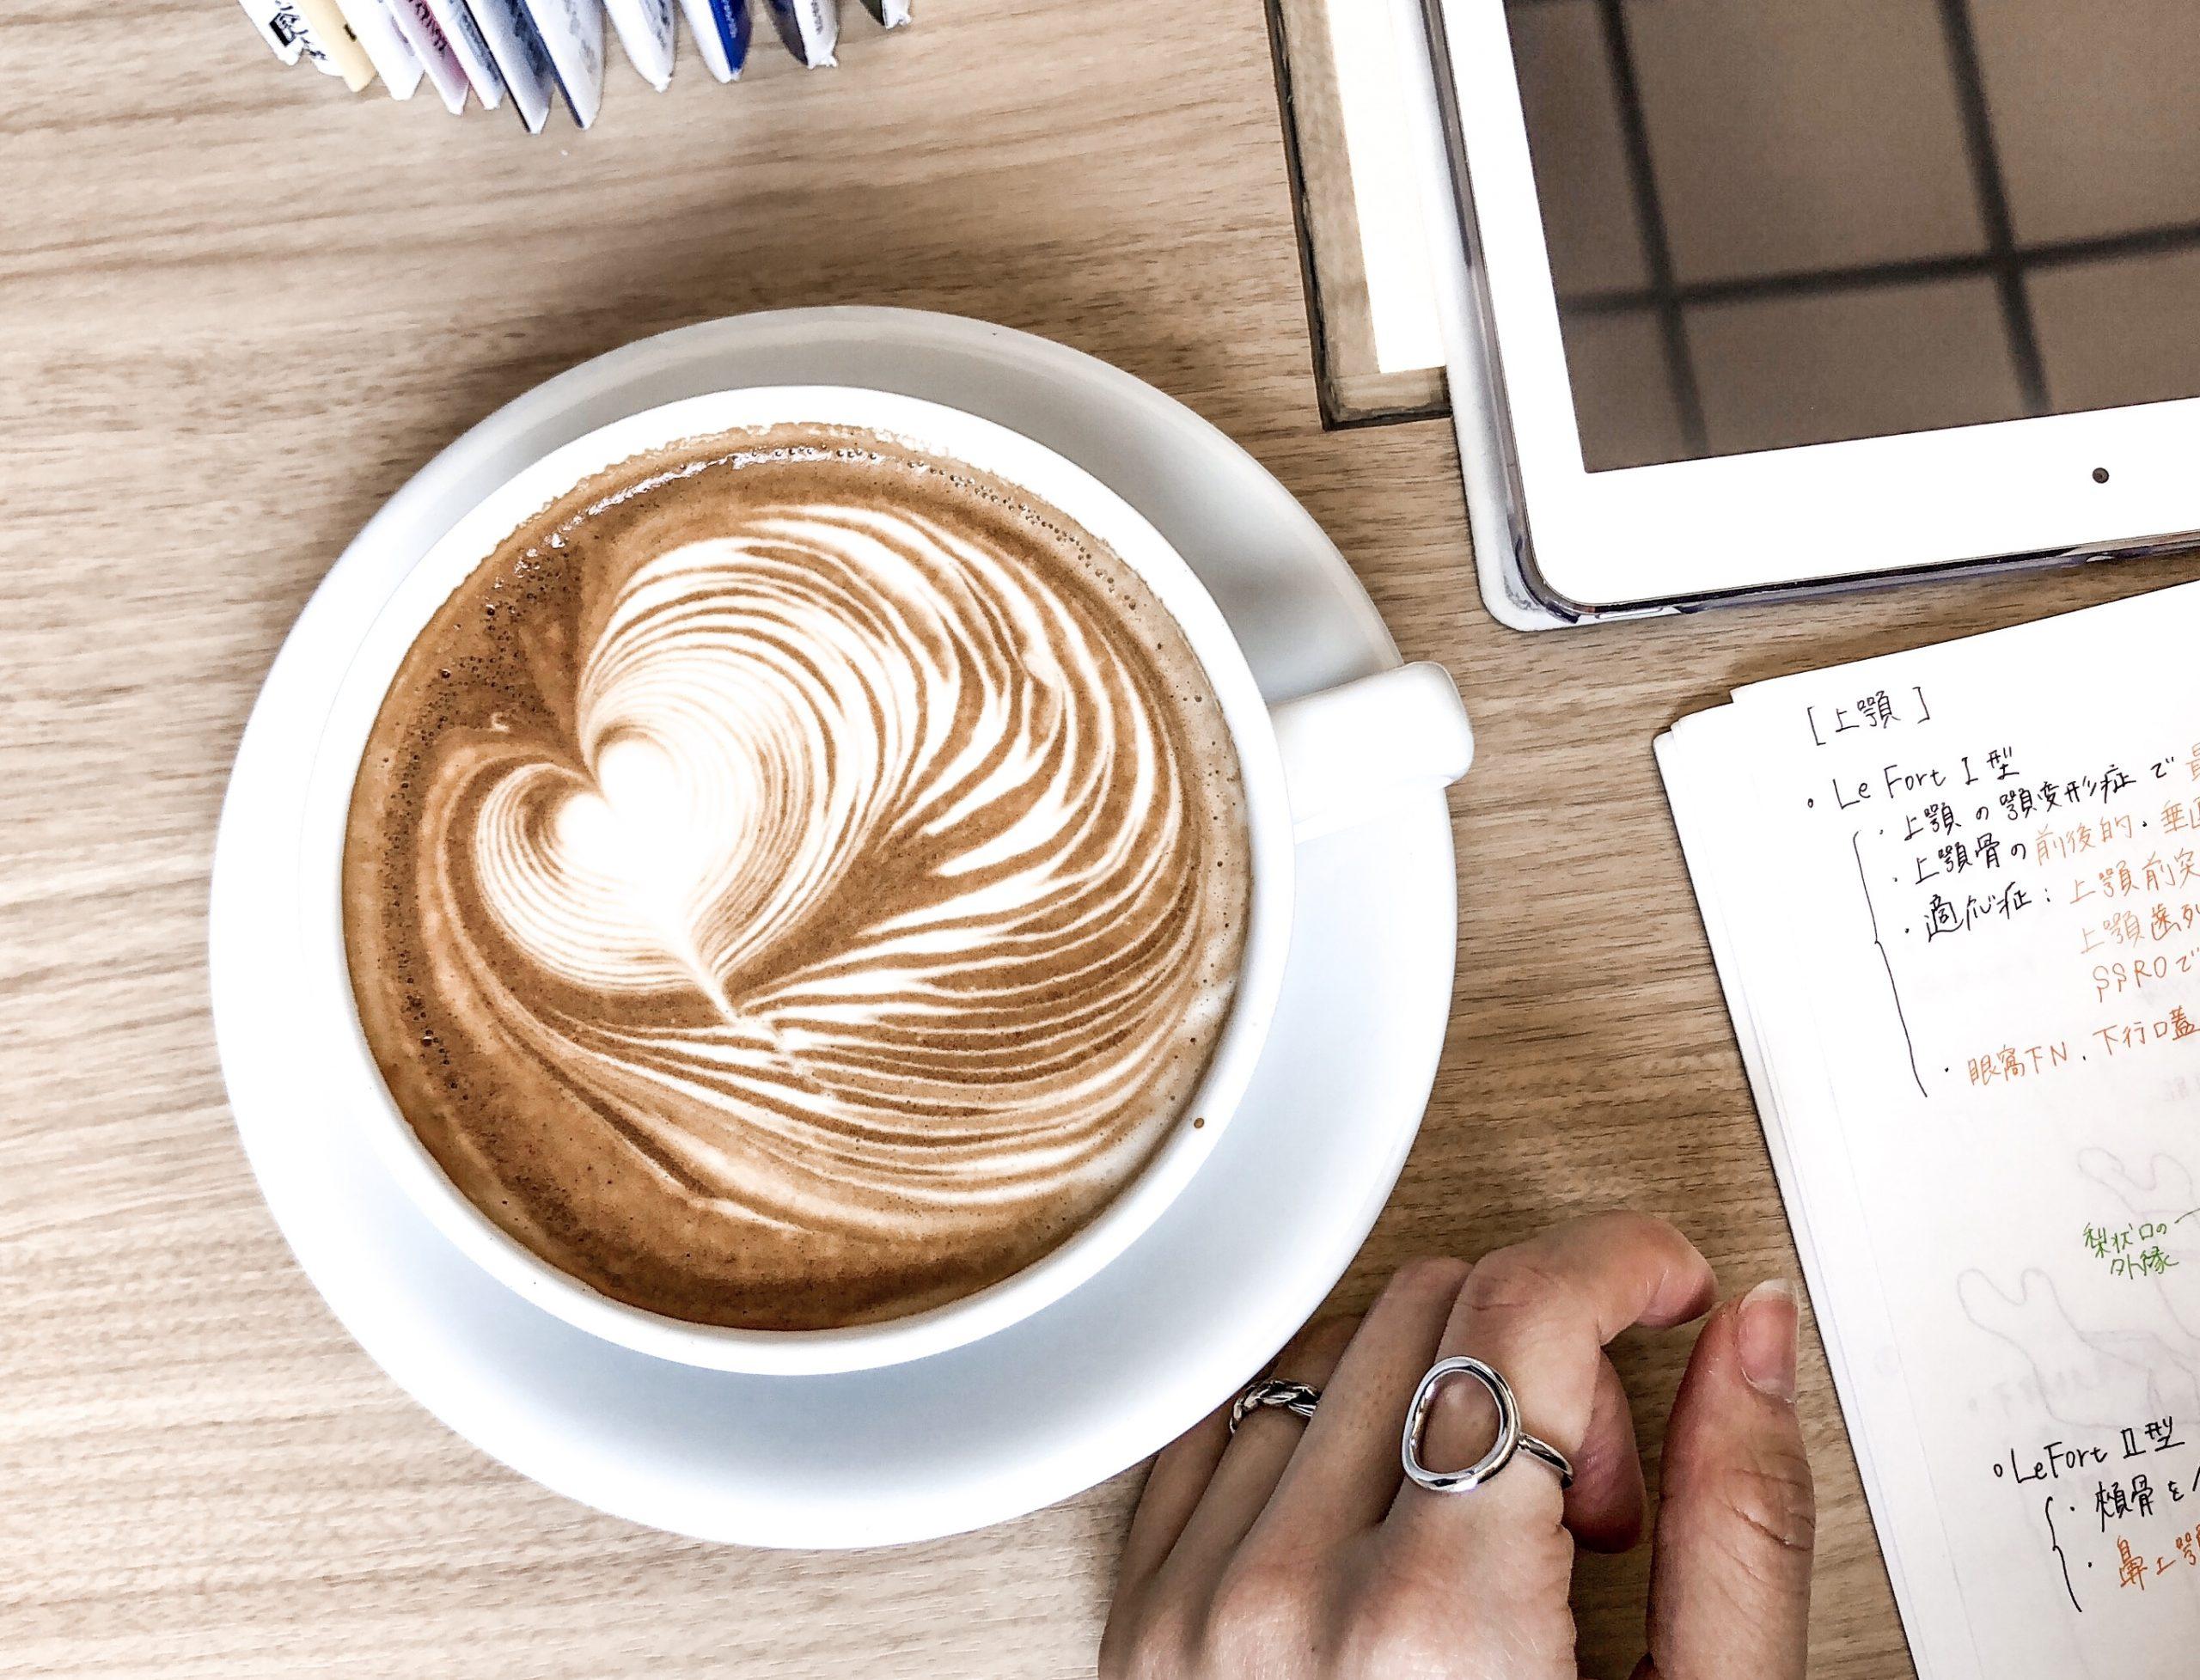 fomula for writing blog posts